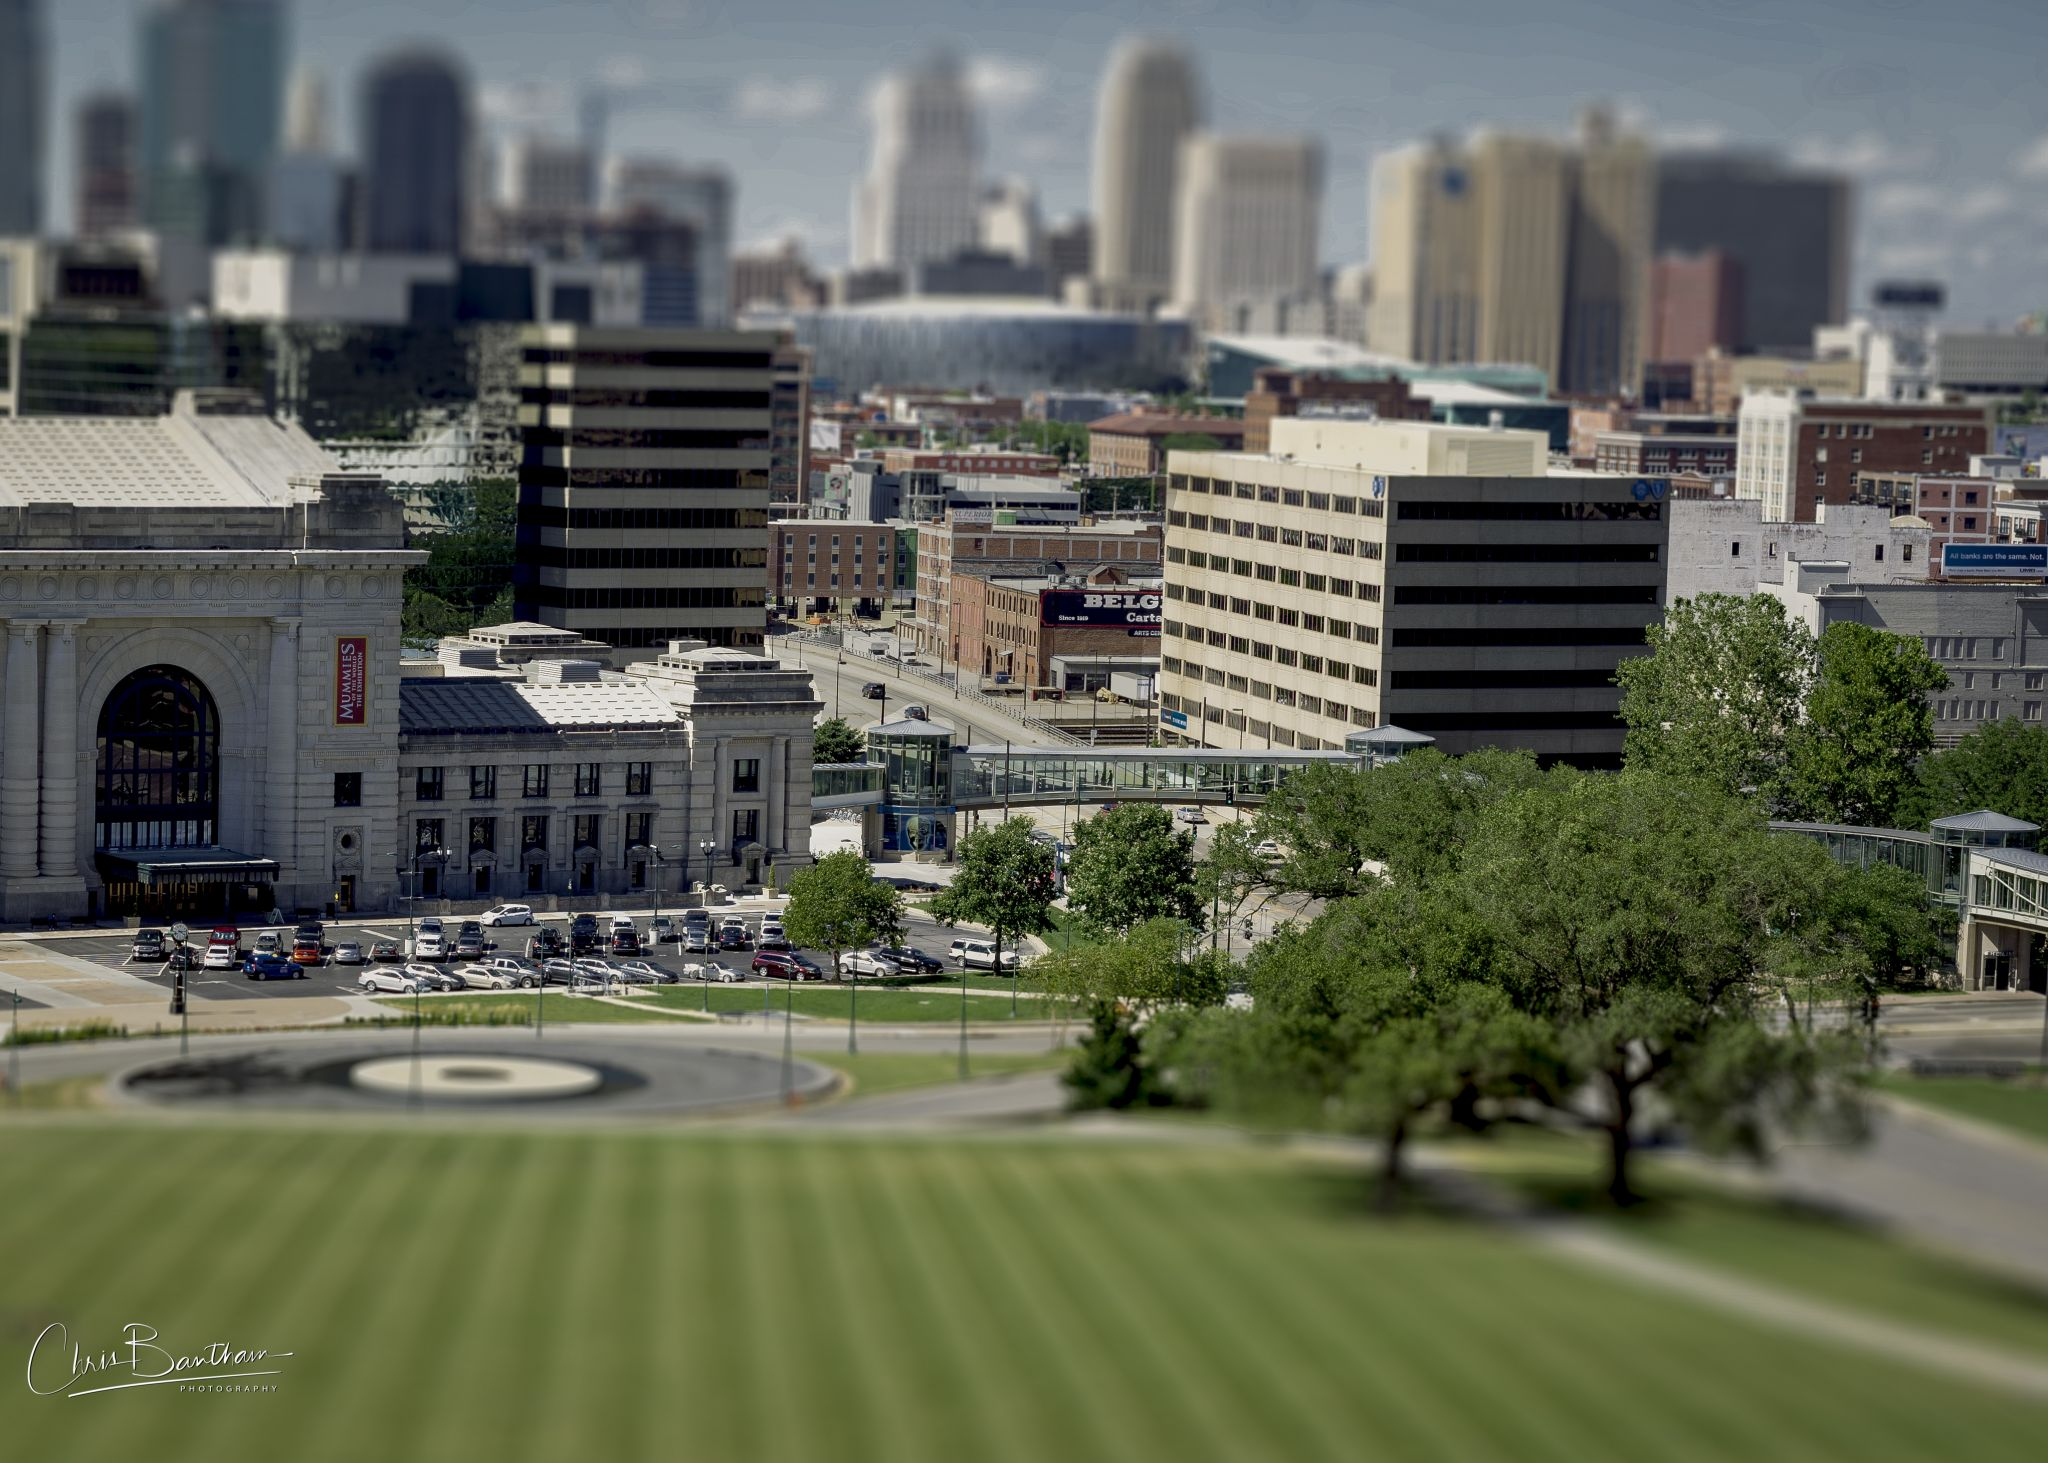 View of Kansas City Union Station, USA